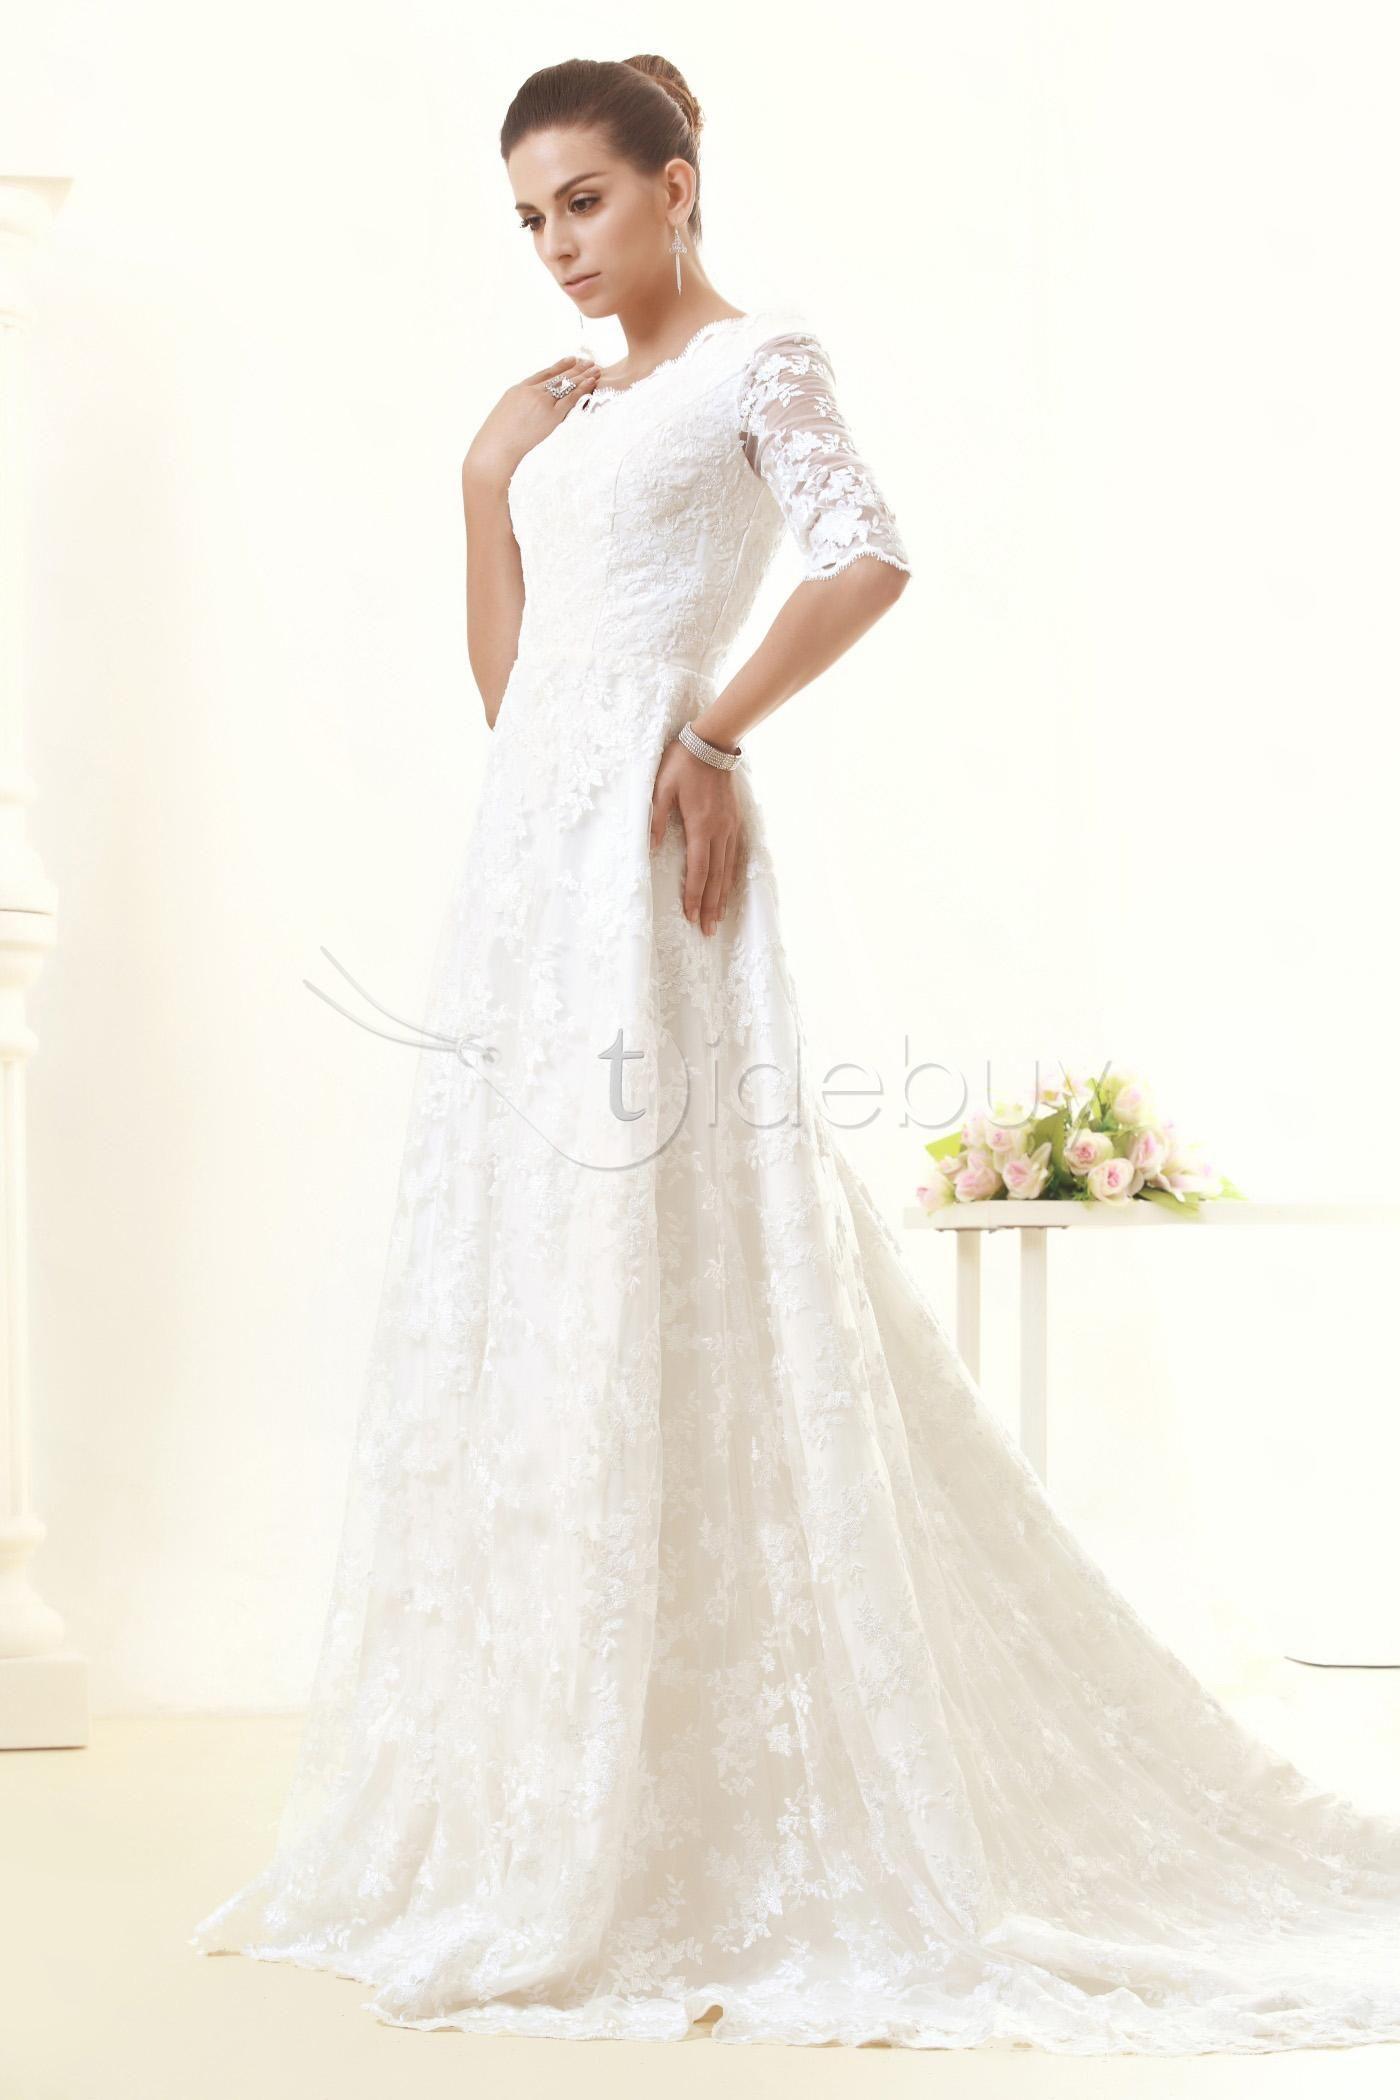 I have finally found my wedding dress ^^ | Wedding Dresses | Pinterest